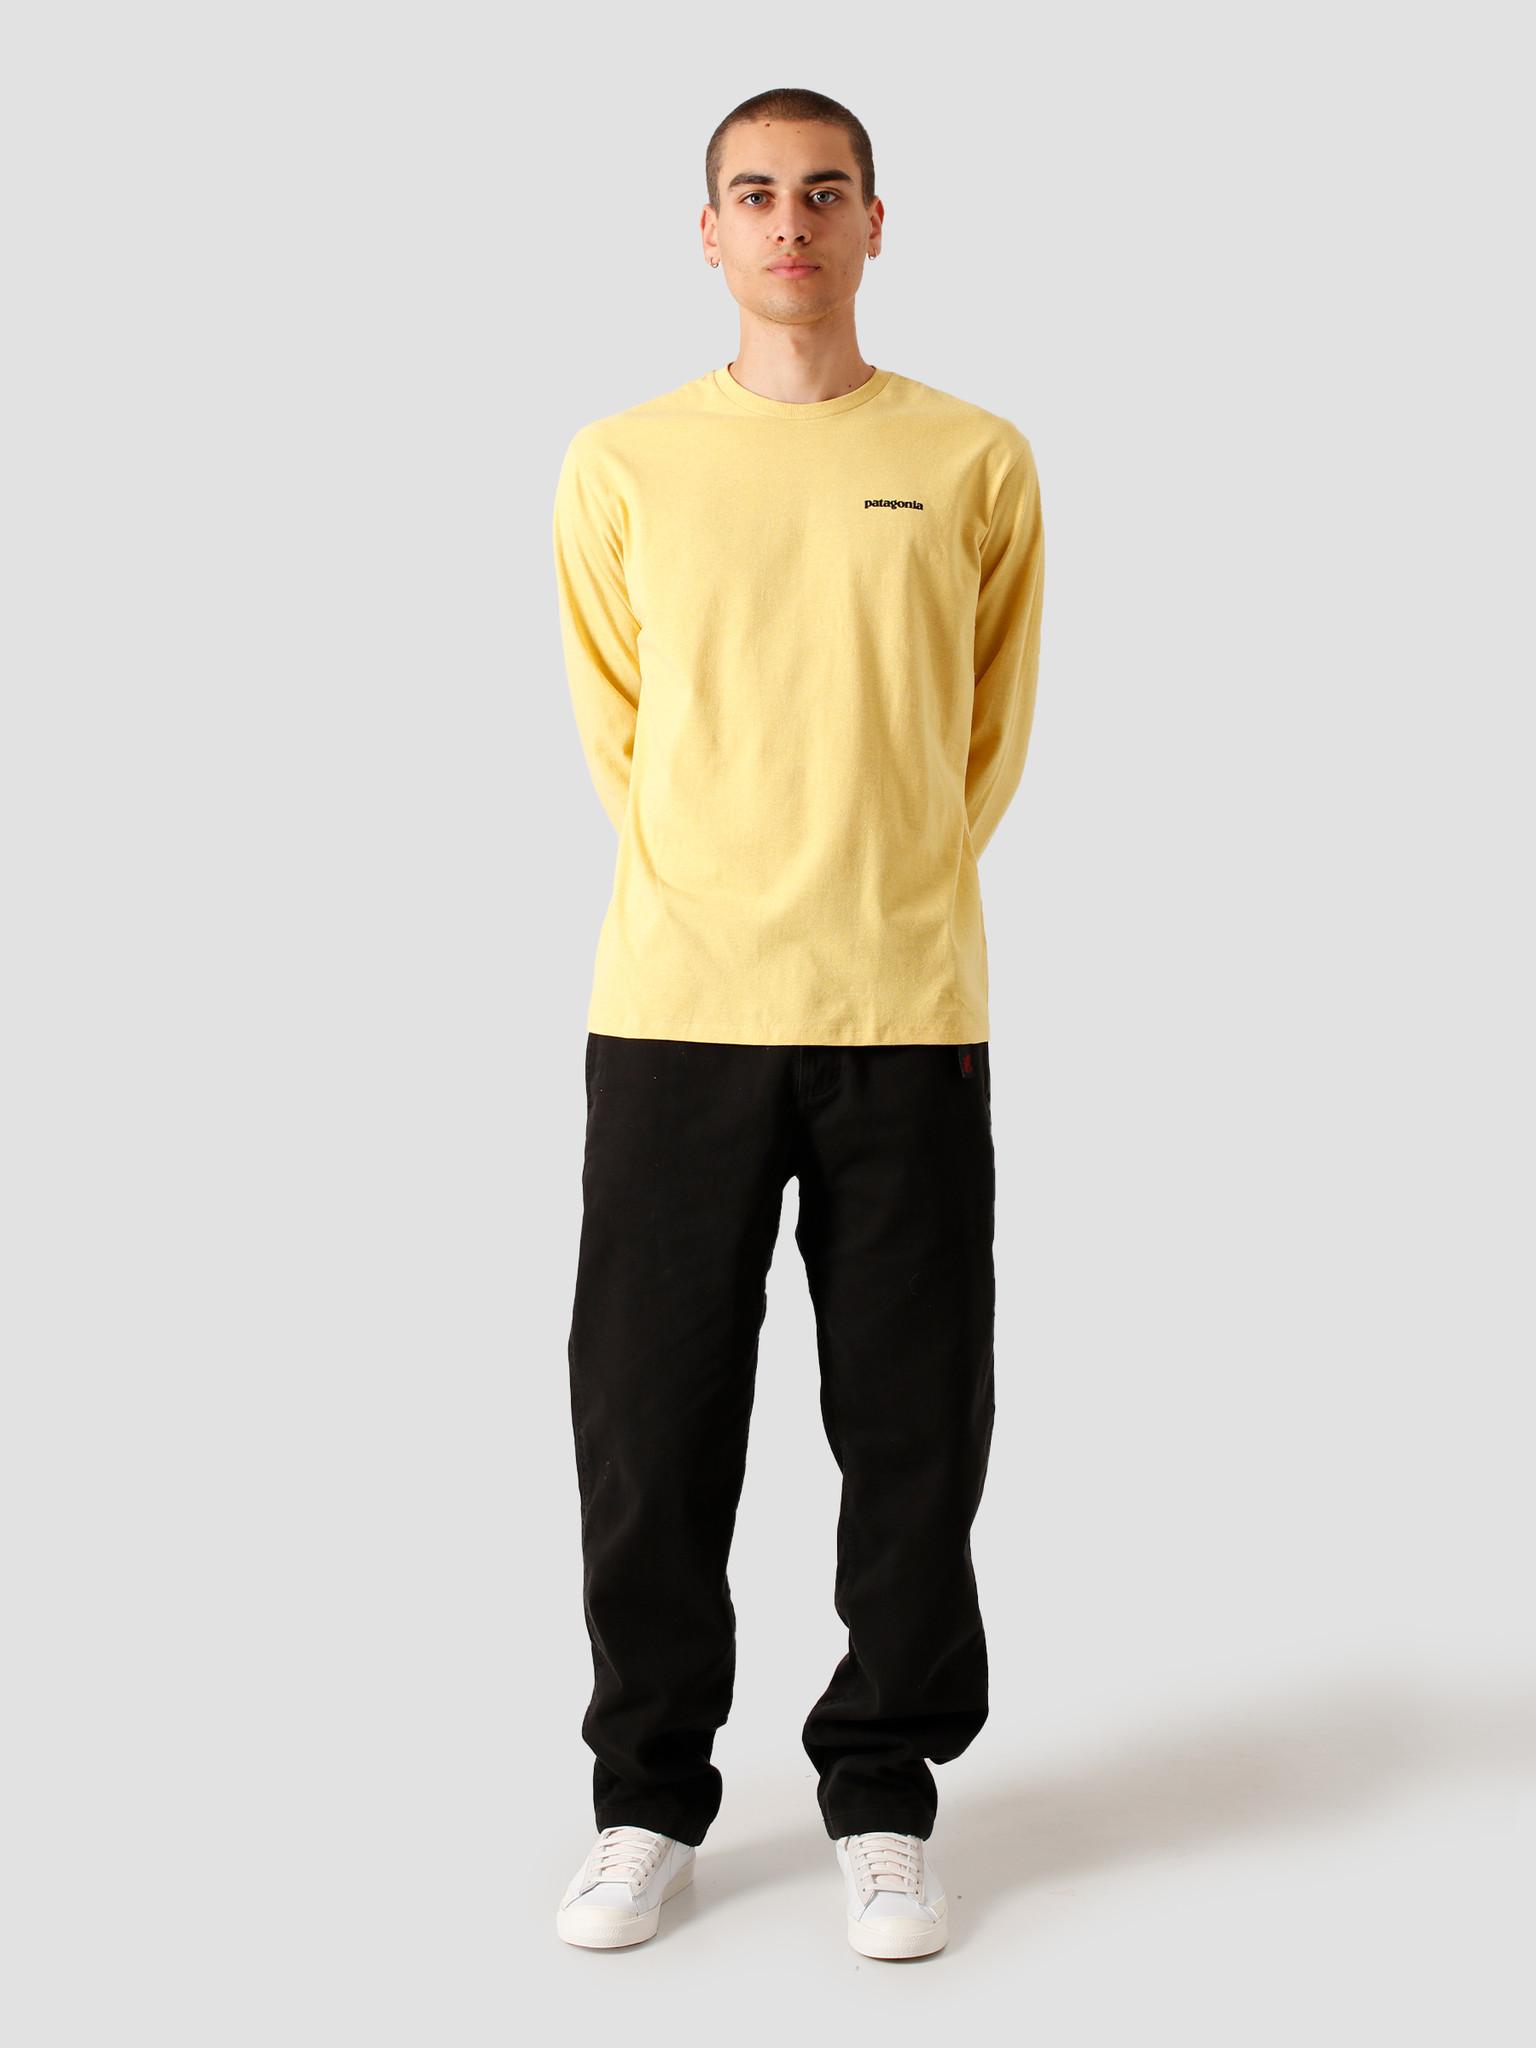 Patagonia Patagonia M's Longsleeve P-6 Logo Responsibili T-Shirt Surfboard Yellow 38518